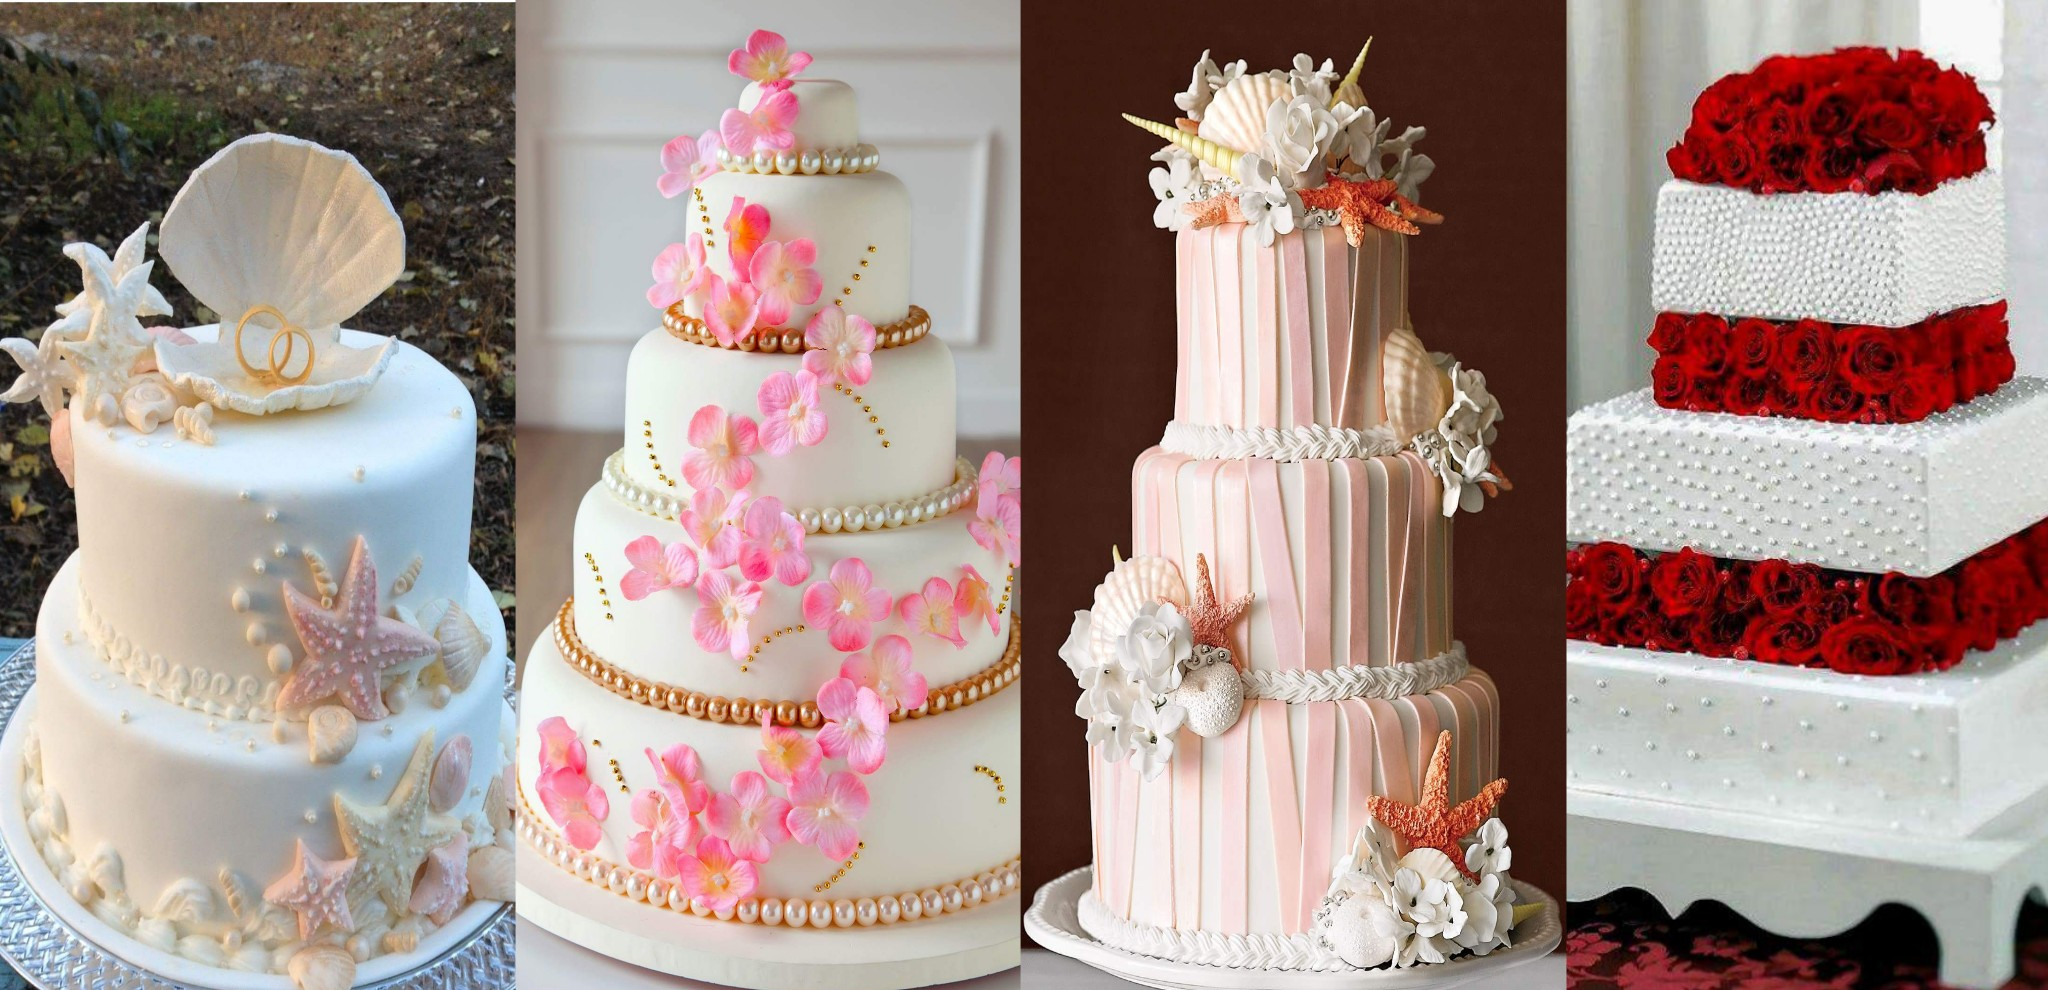 List of the best wedding cakes bakeries within nairobi victor matara written by john nyabuto october 13 2017 junglespirit Gallery